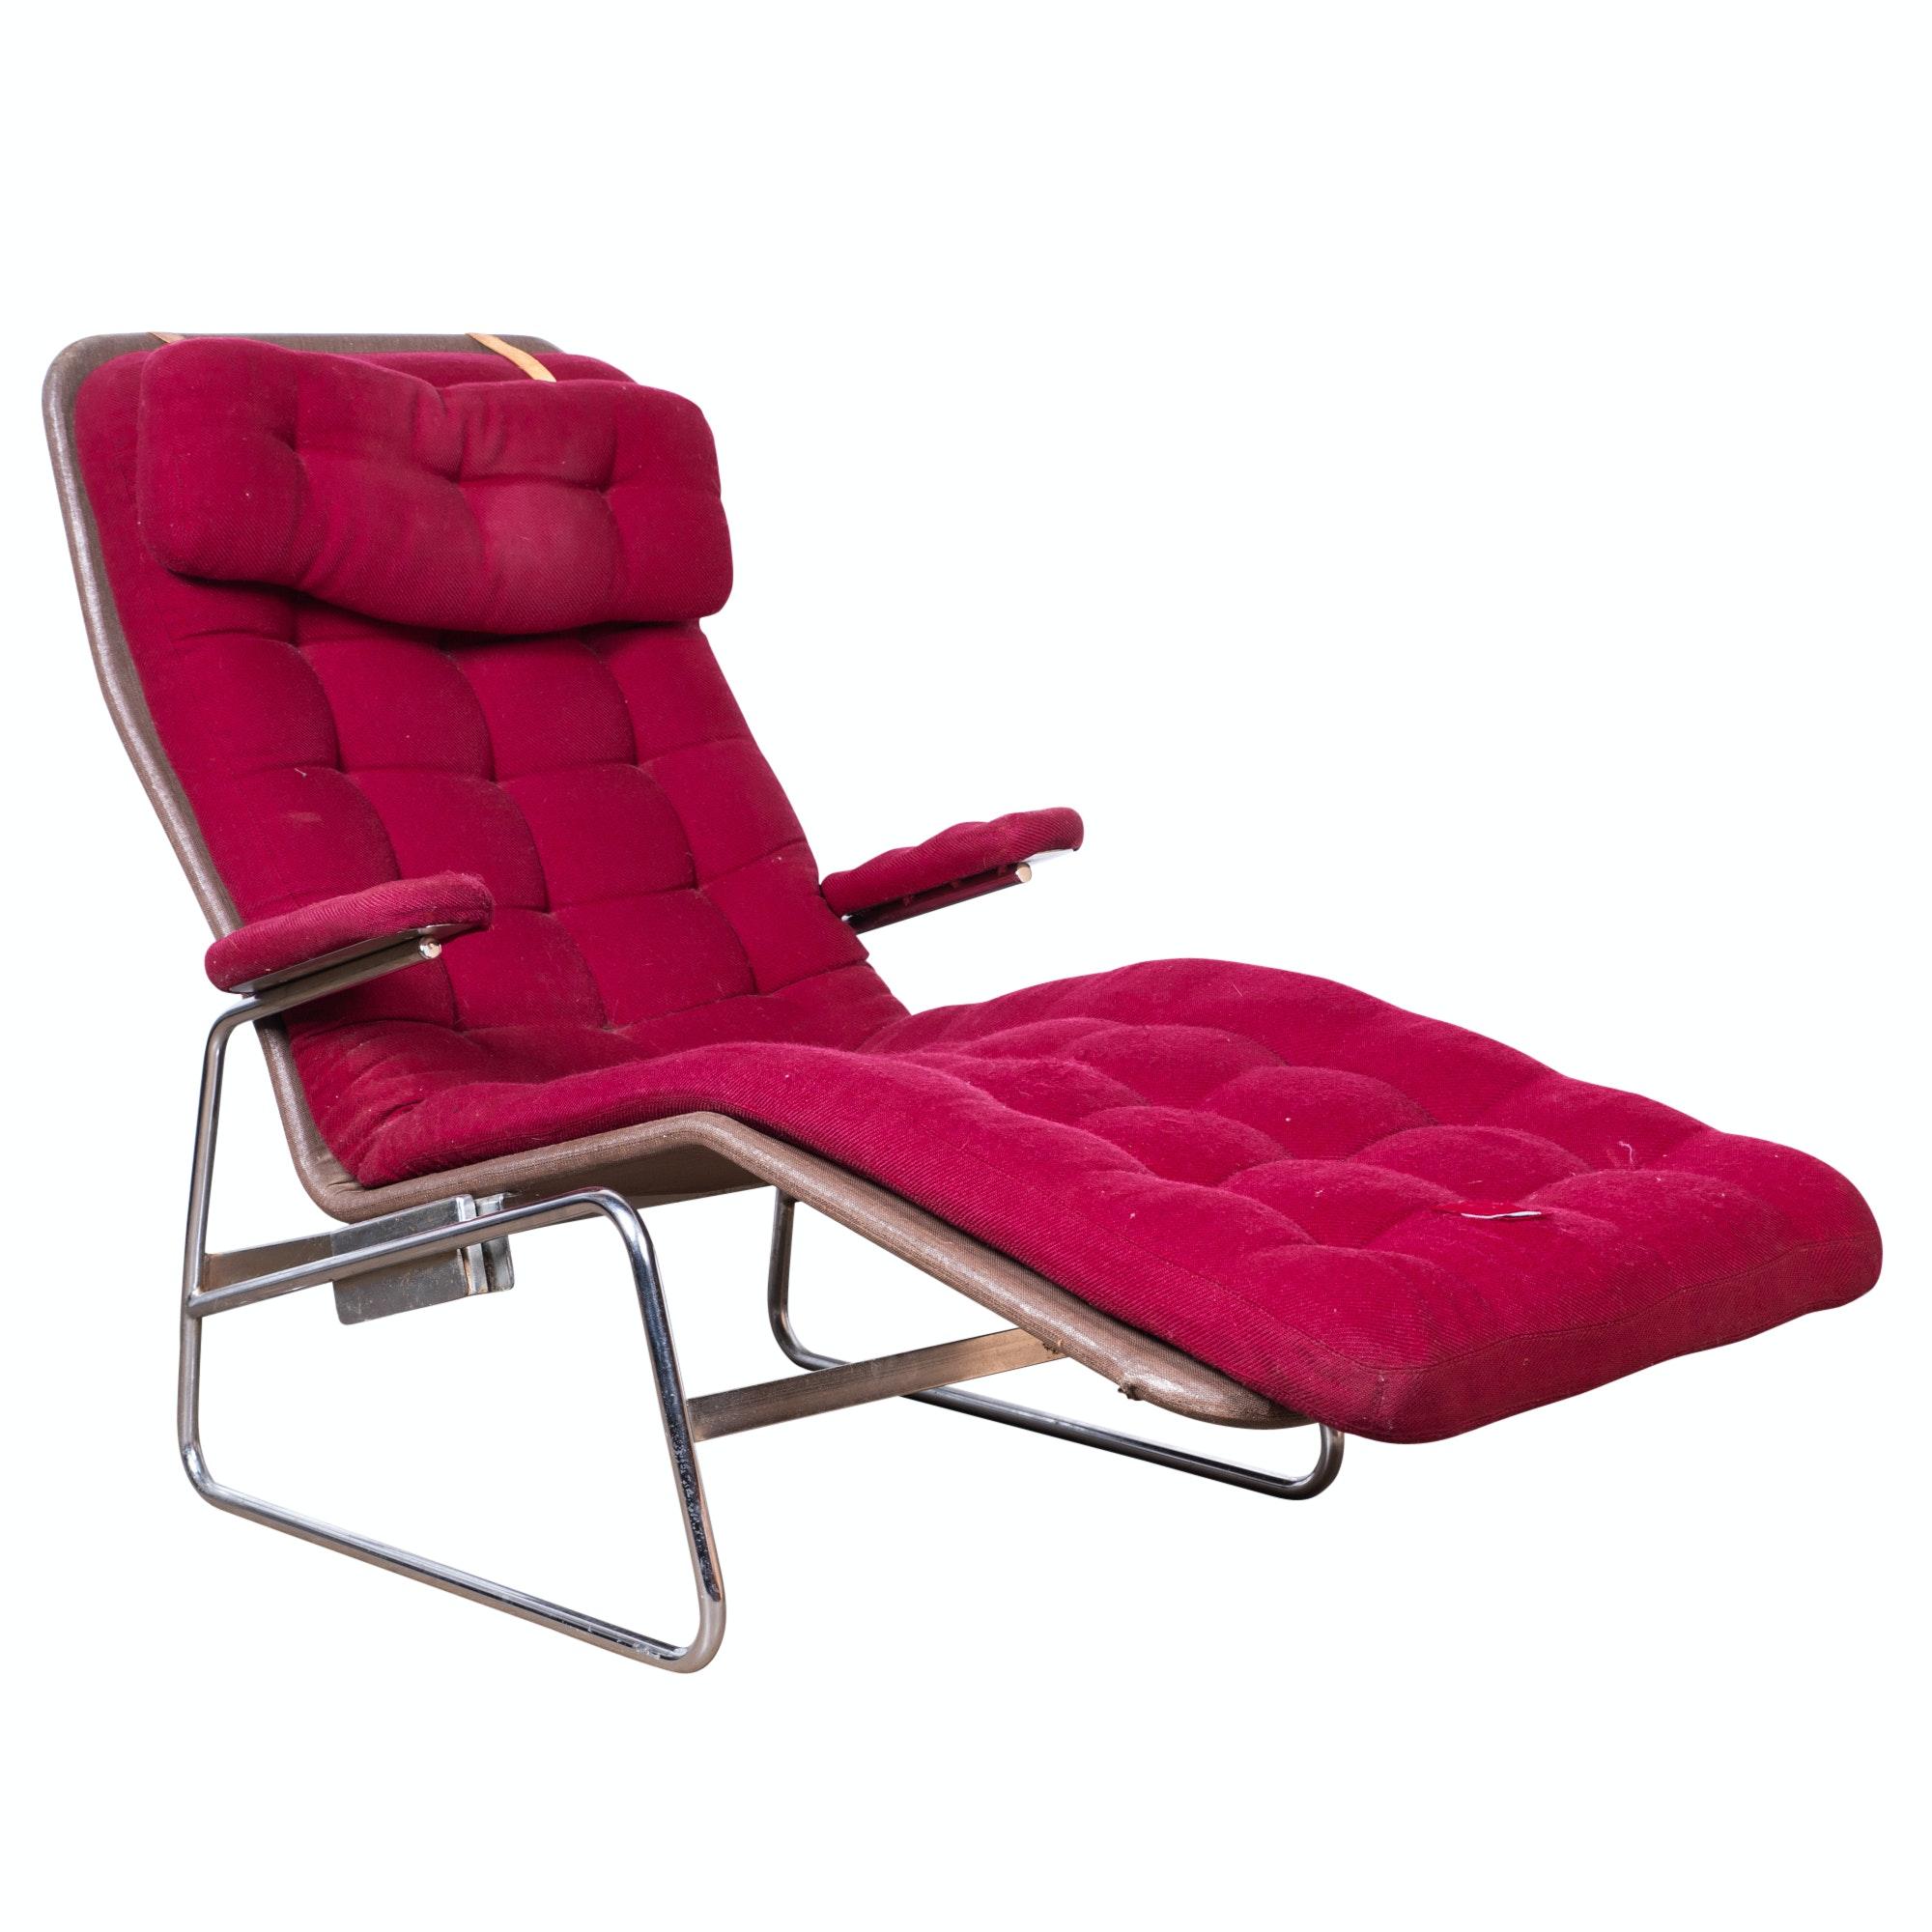 """Fenix"" Chromed Tubular Lounge Chair by Sam Larsson for DUX, Mid-20th Century"